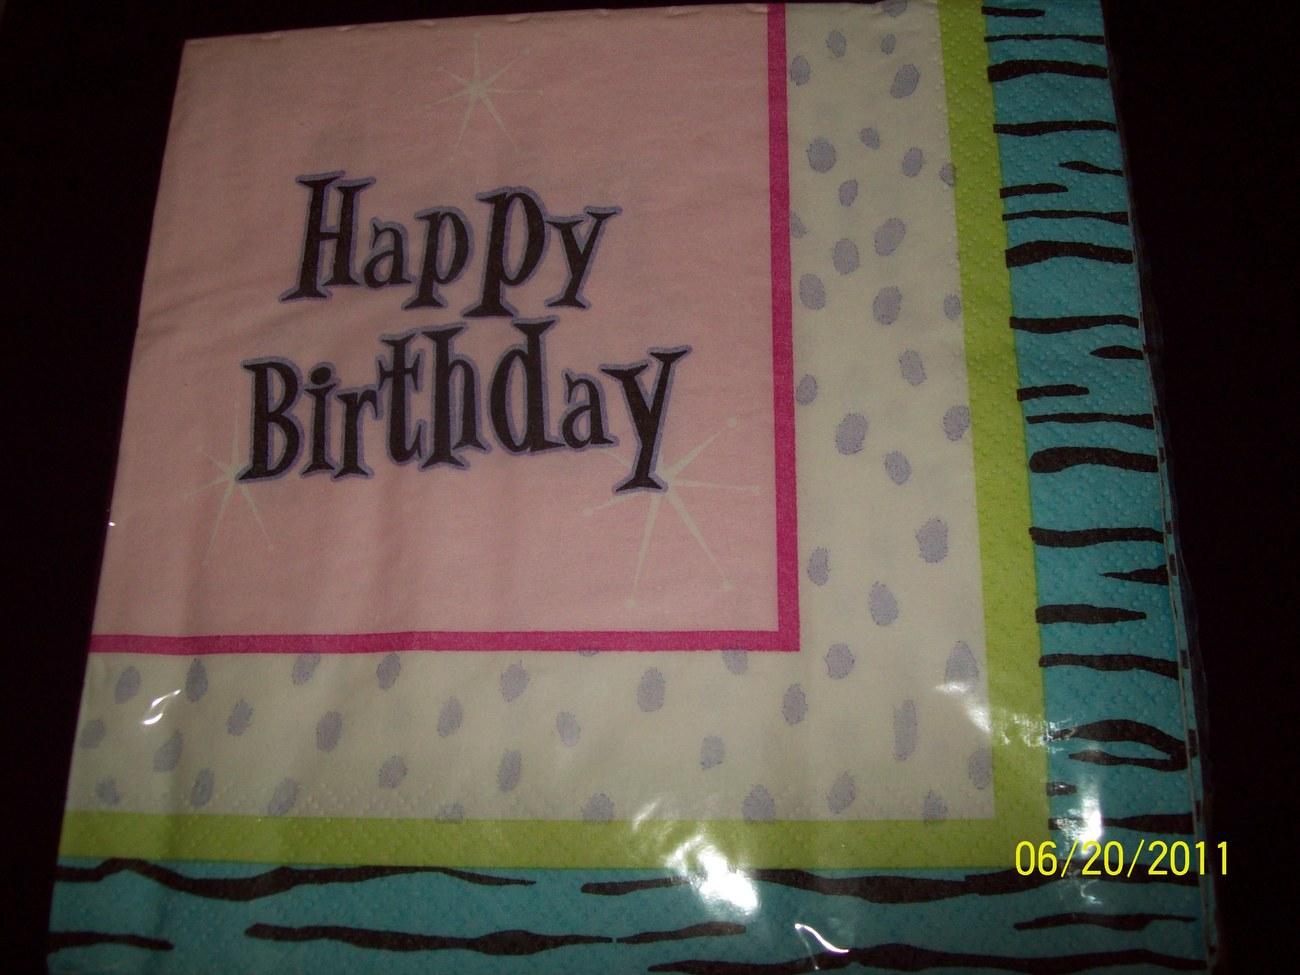 3 PACKS HAPPY BIRTHDAY Zebra Print Luncheon NAPKINS 16ct - 3ply NEW